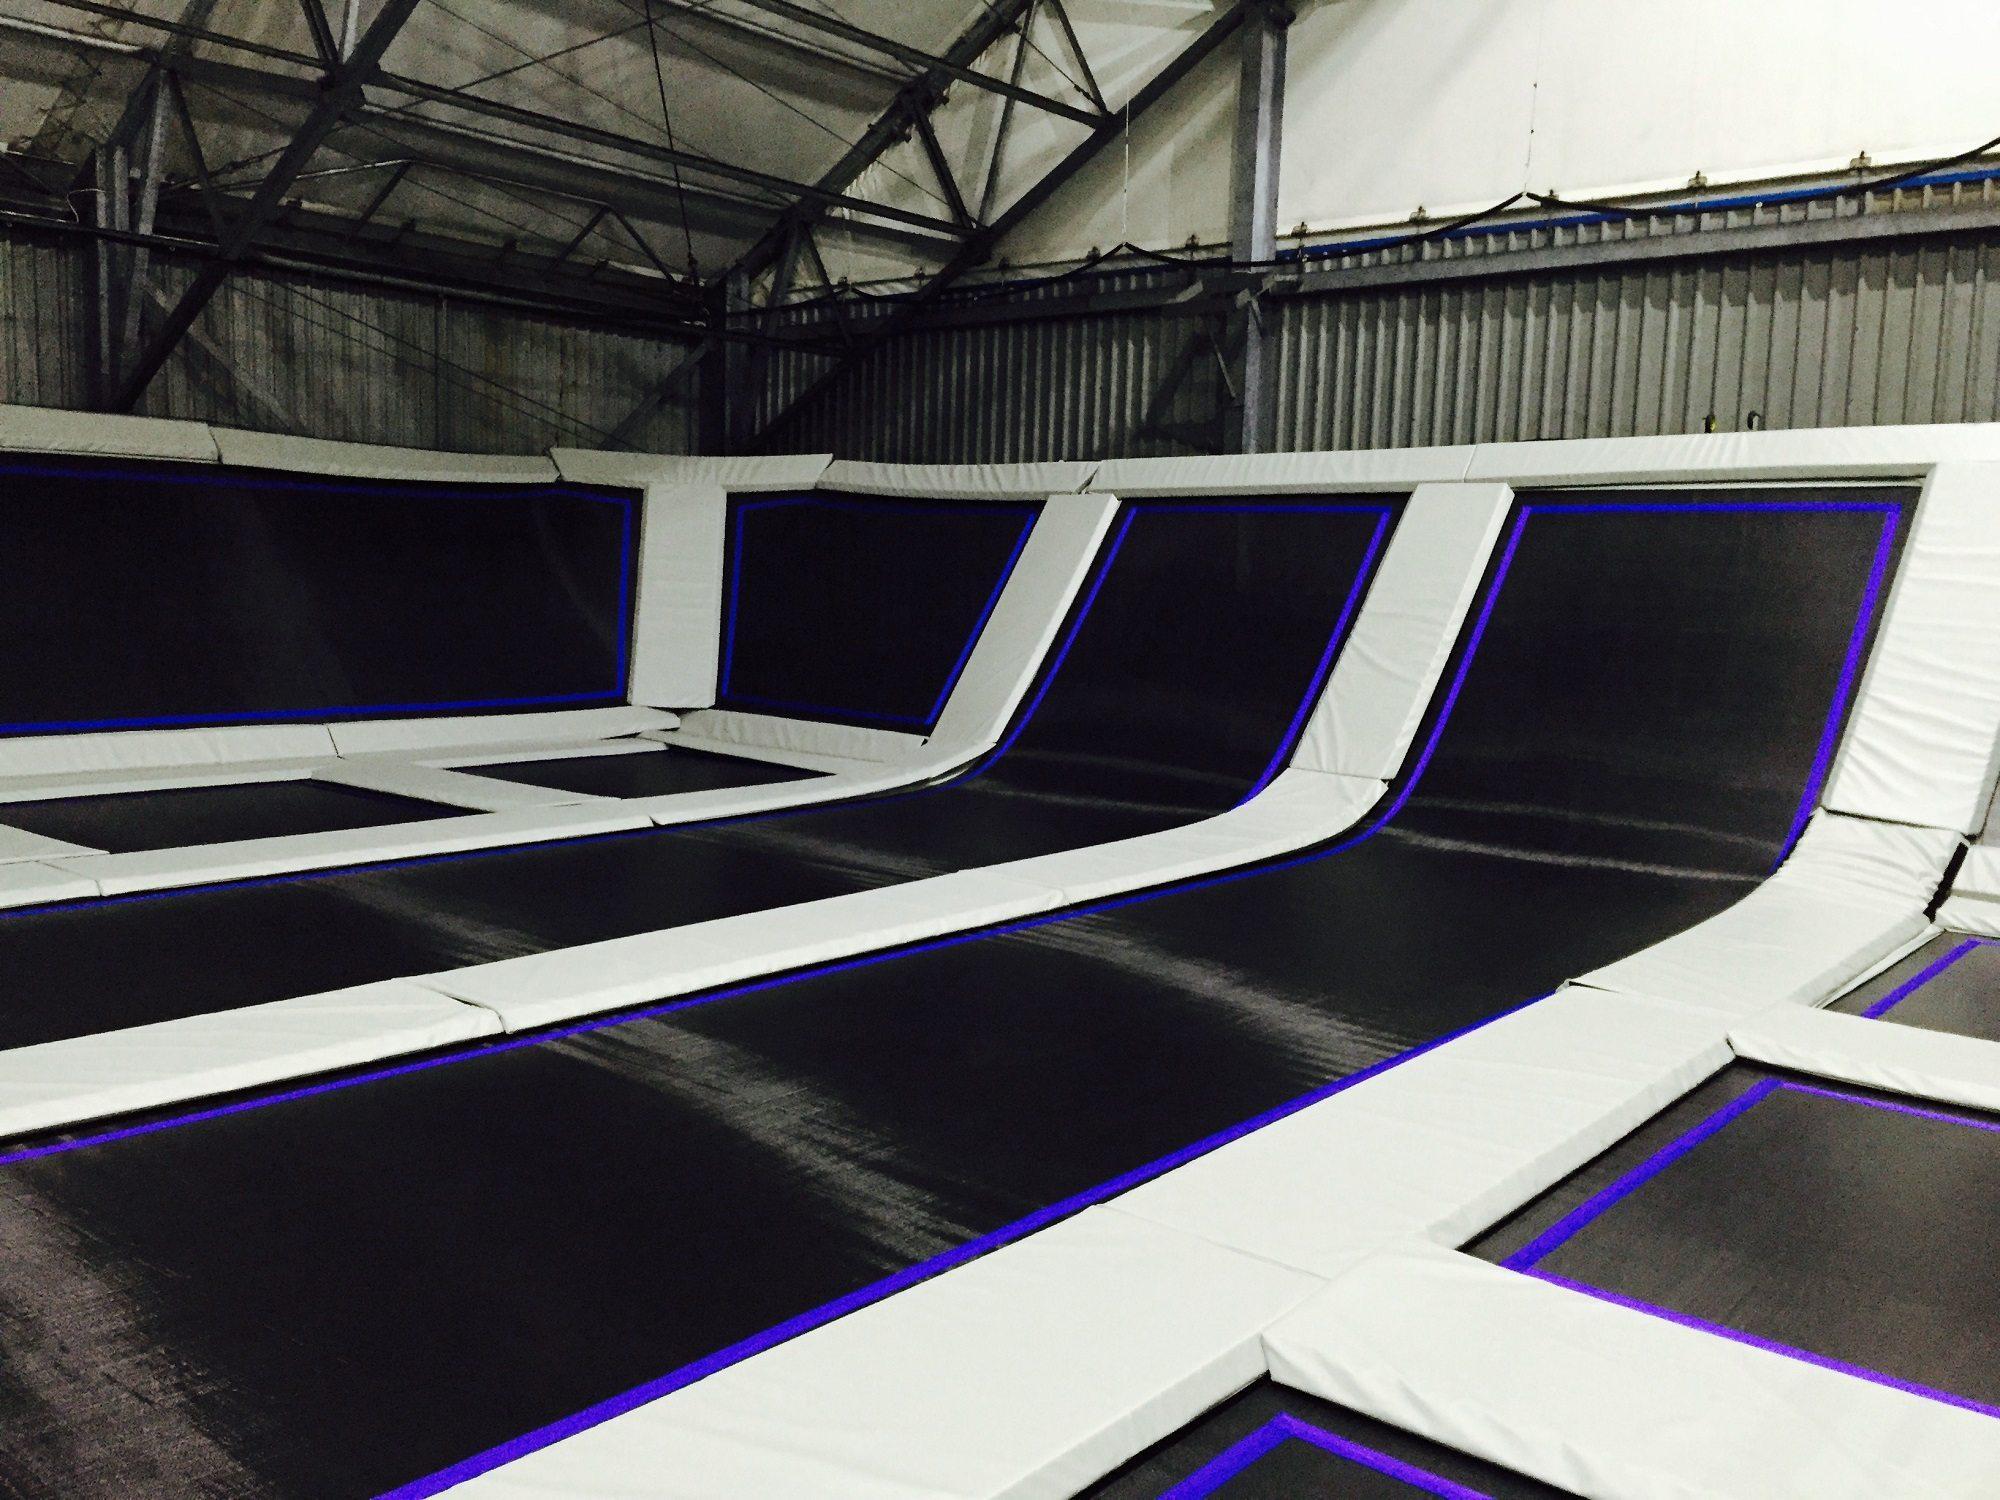 trampoline padding